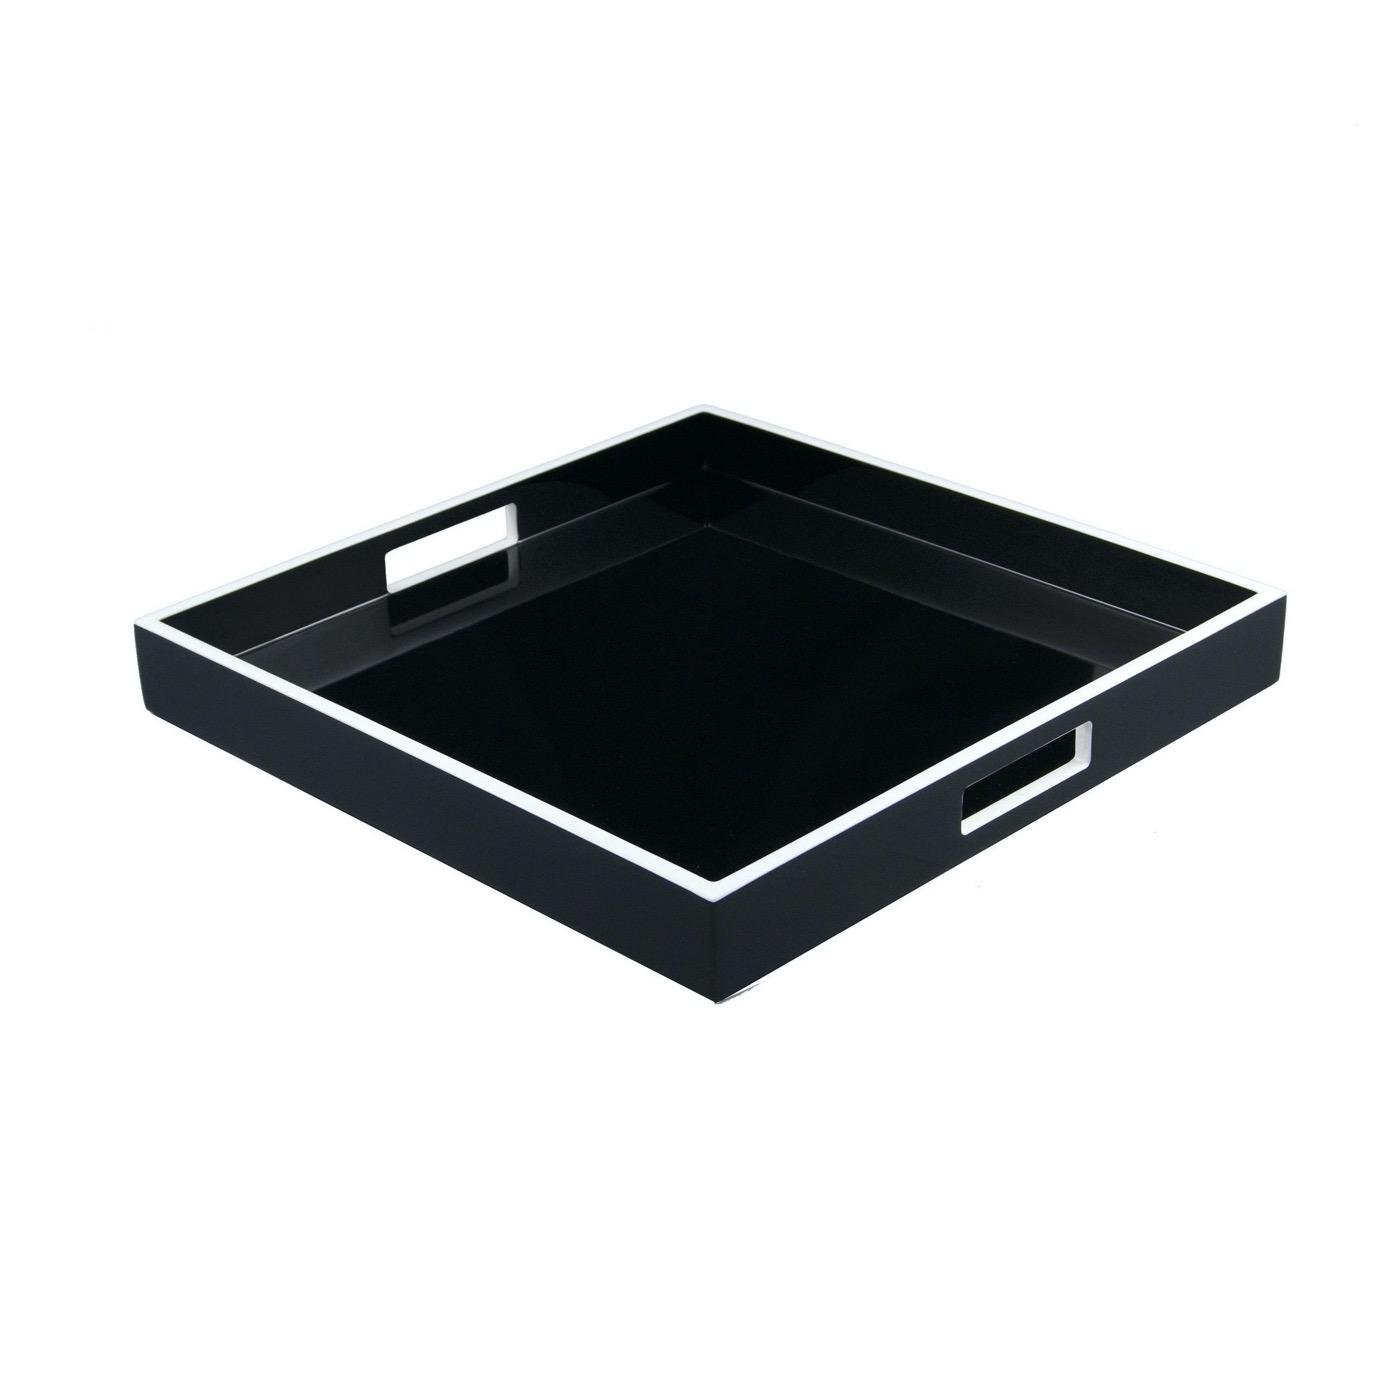 Ellie Square Lacquered Trays | Black w/White Trim